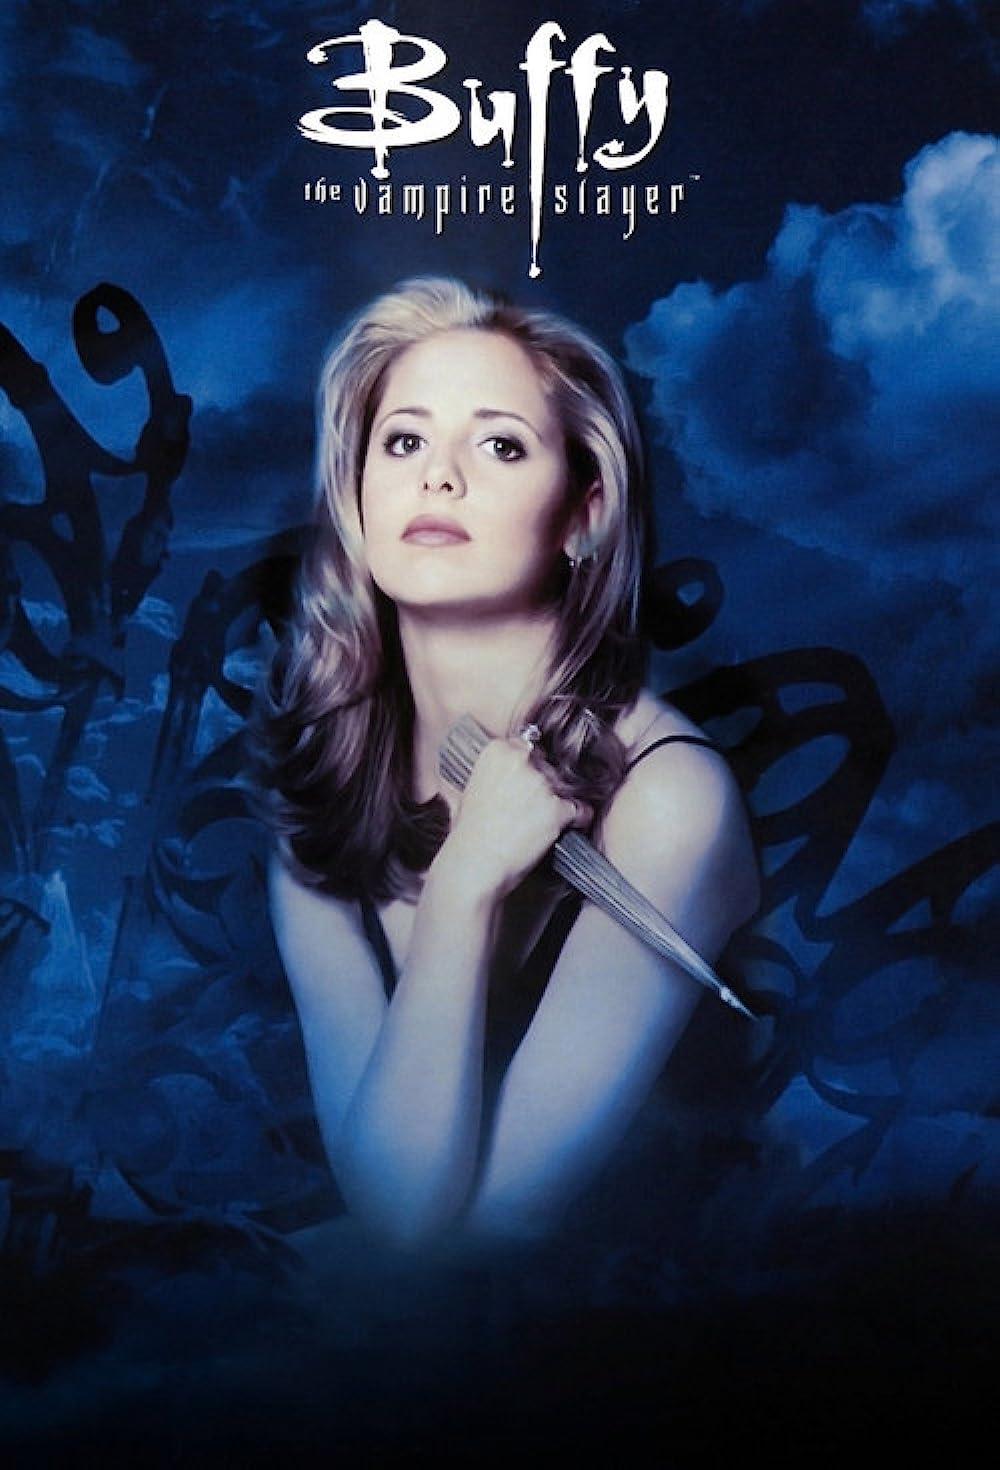 Buffy the Vampire Slayer (TV Series 1997–2003) - IMDb